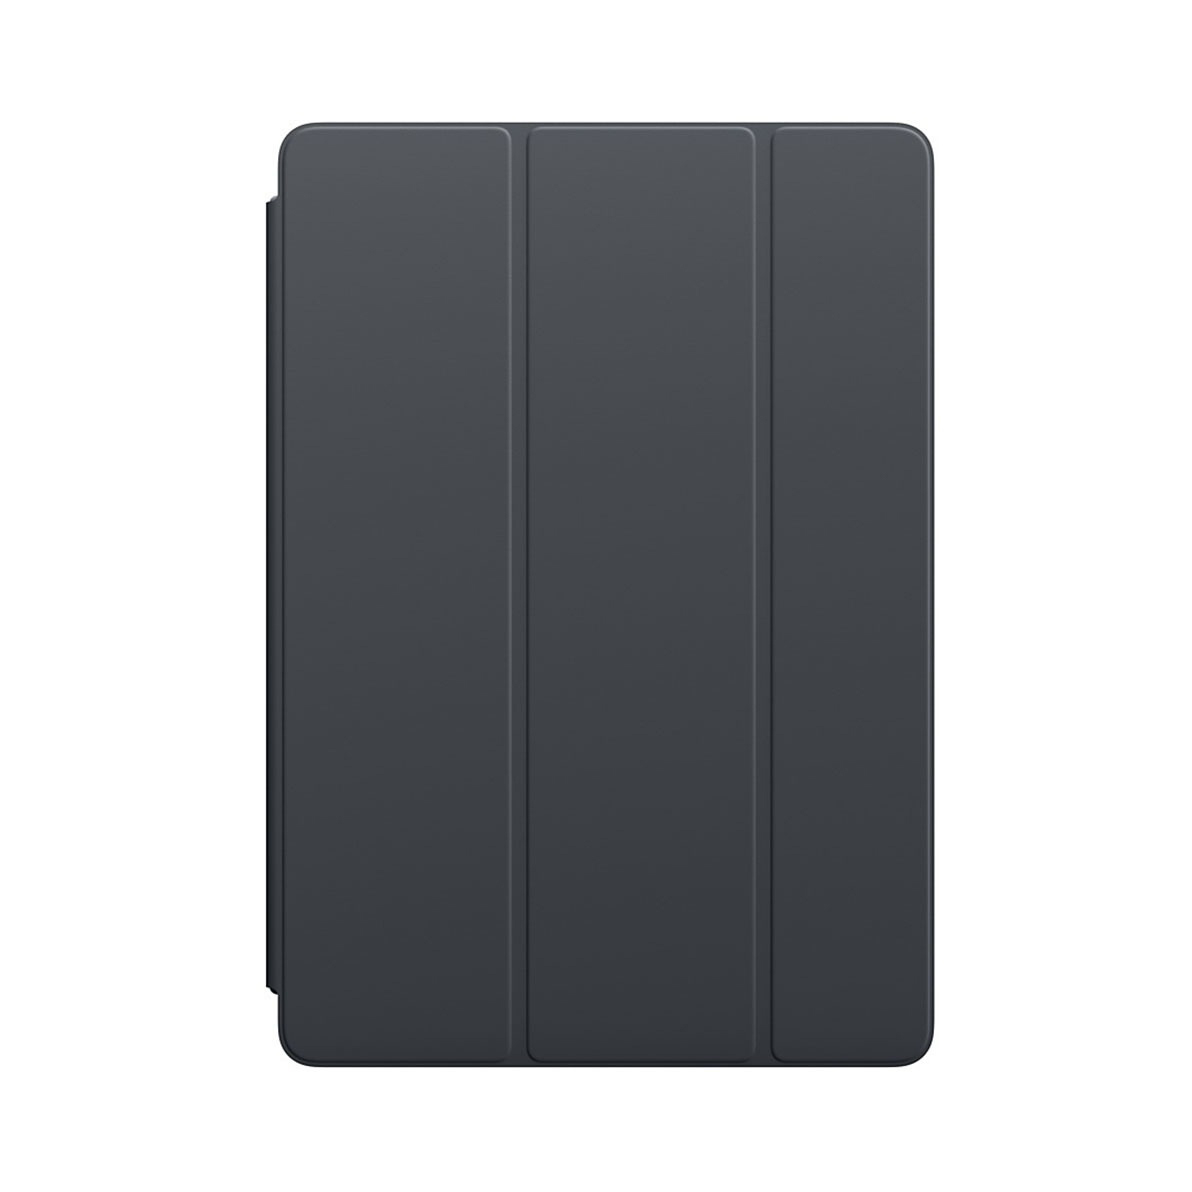 Чехол для планшета Apple iPad Smart Cover 9.7 Charcoal Gray